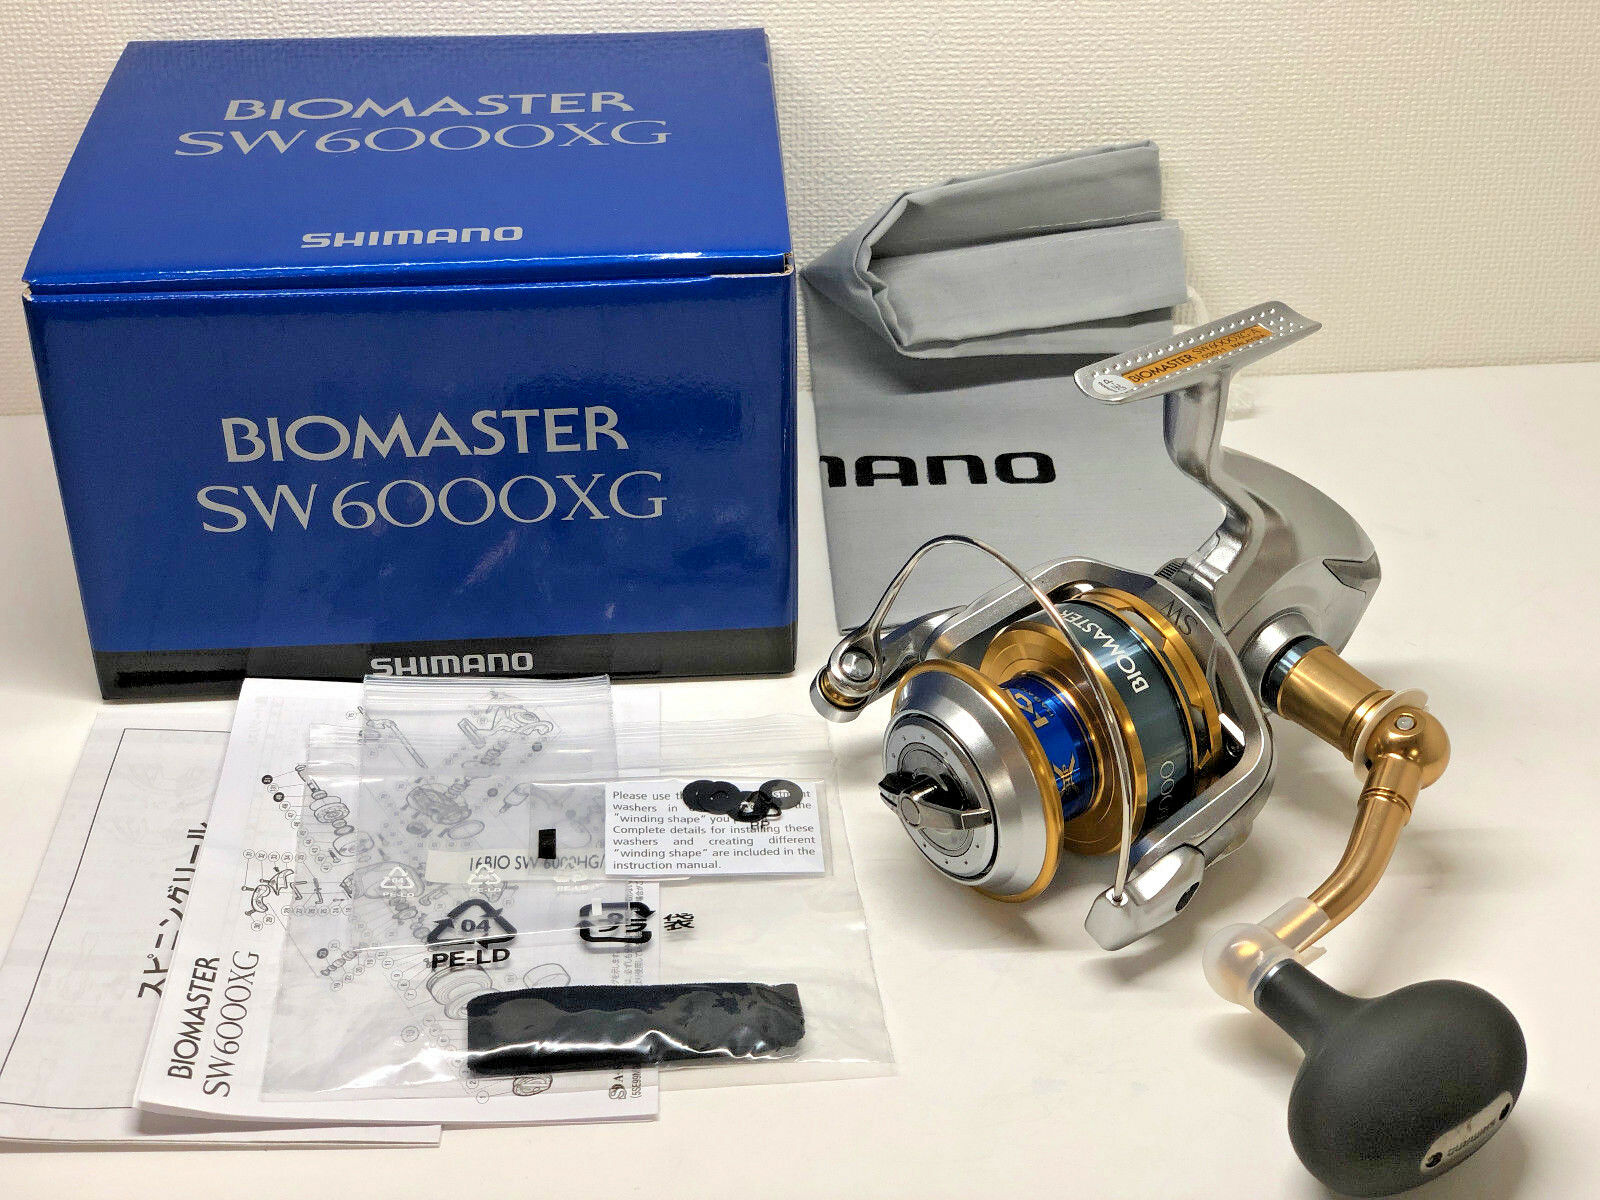 SHIMANO 16 BIOMASTER SW 6000XG   - Free Shipping from Japan